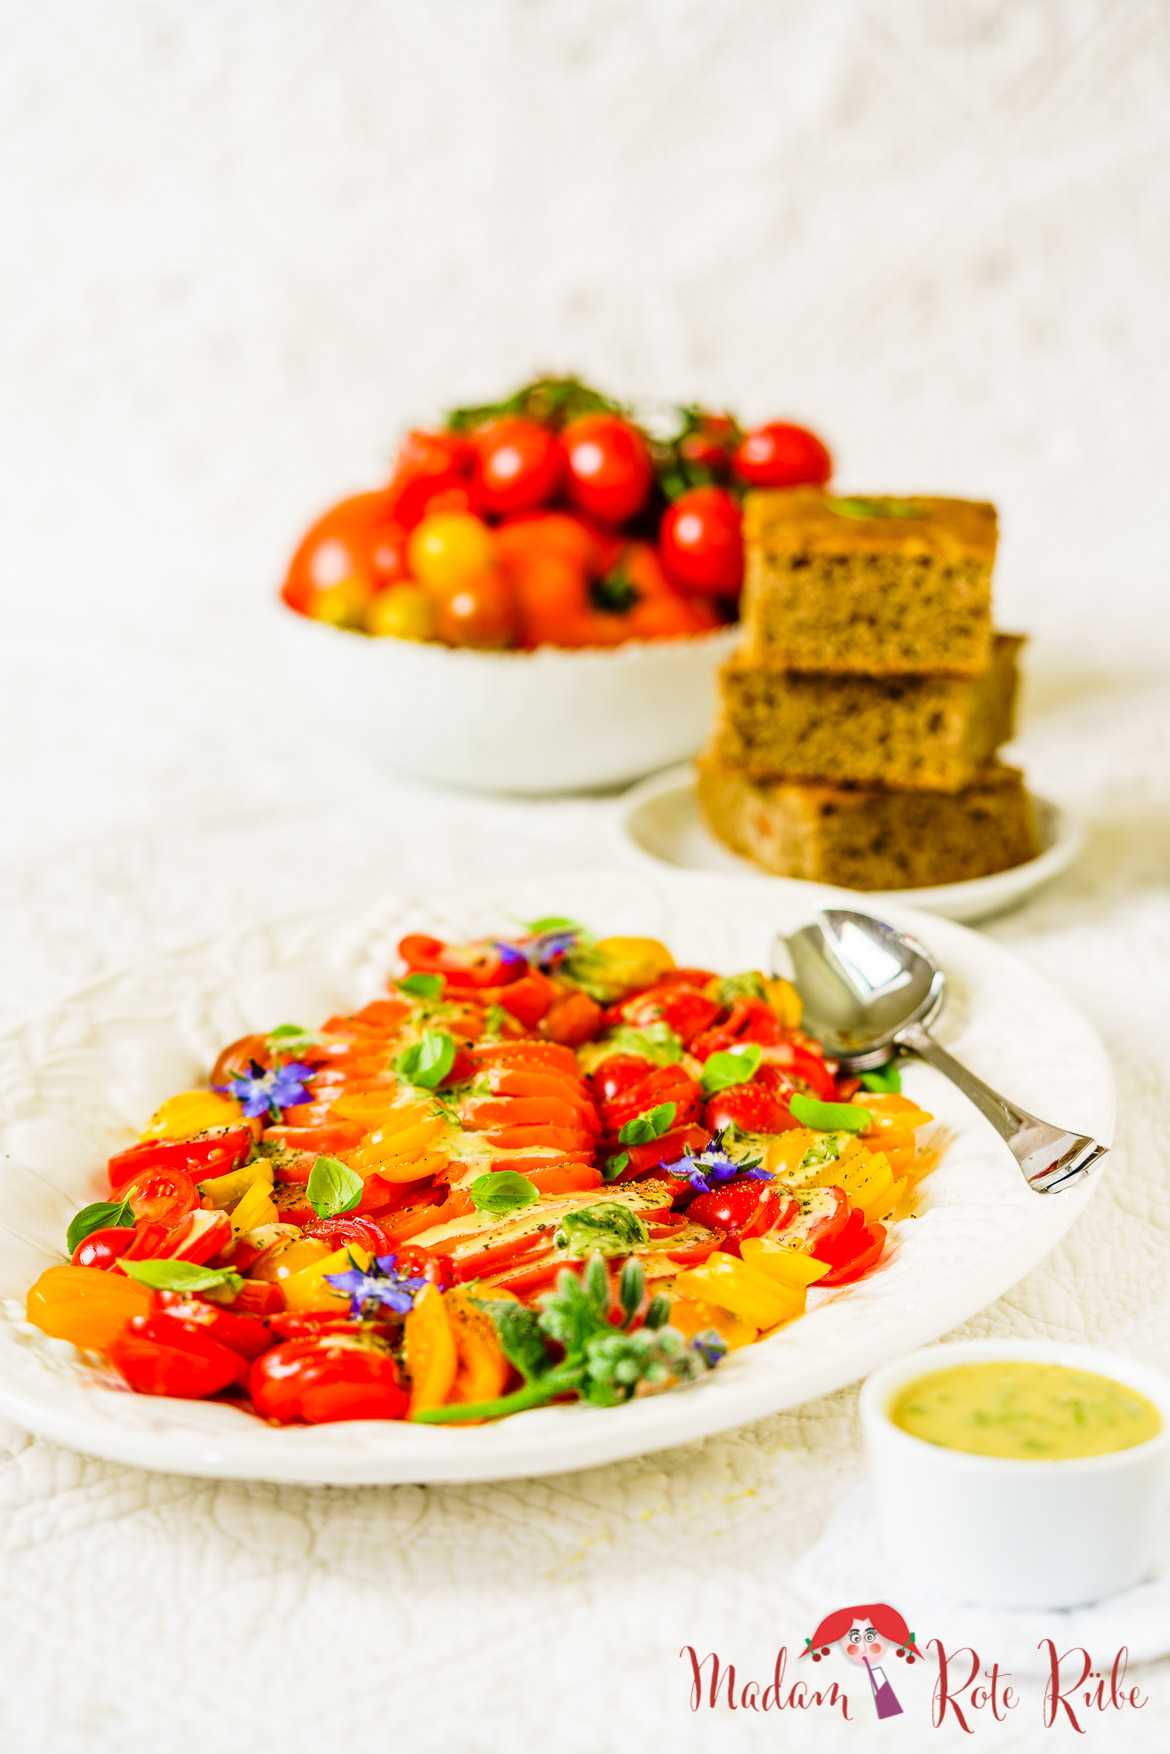 Madam Rote Rübe - Bunter Tomatensalat mit mediterraner Aprikosen-Senf-Vinaigrette